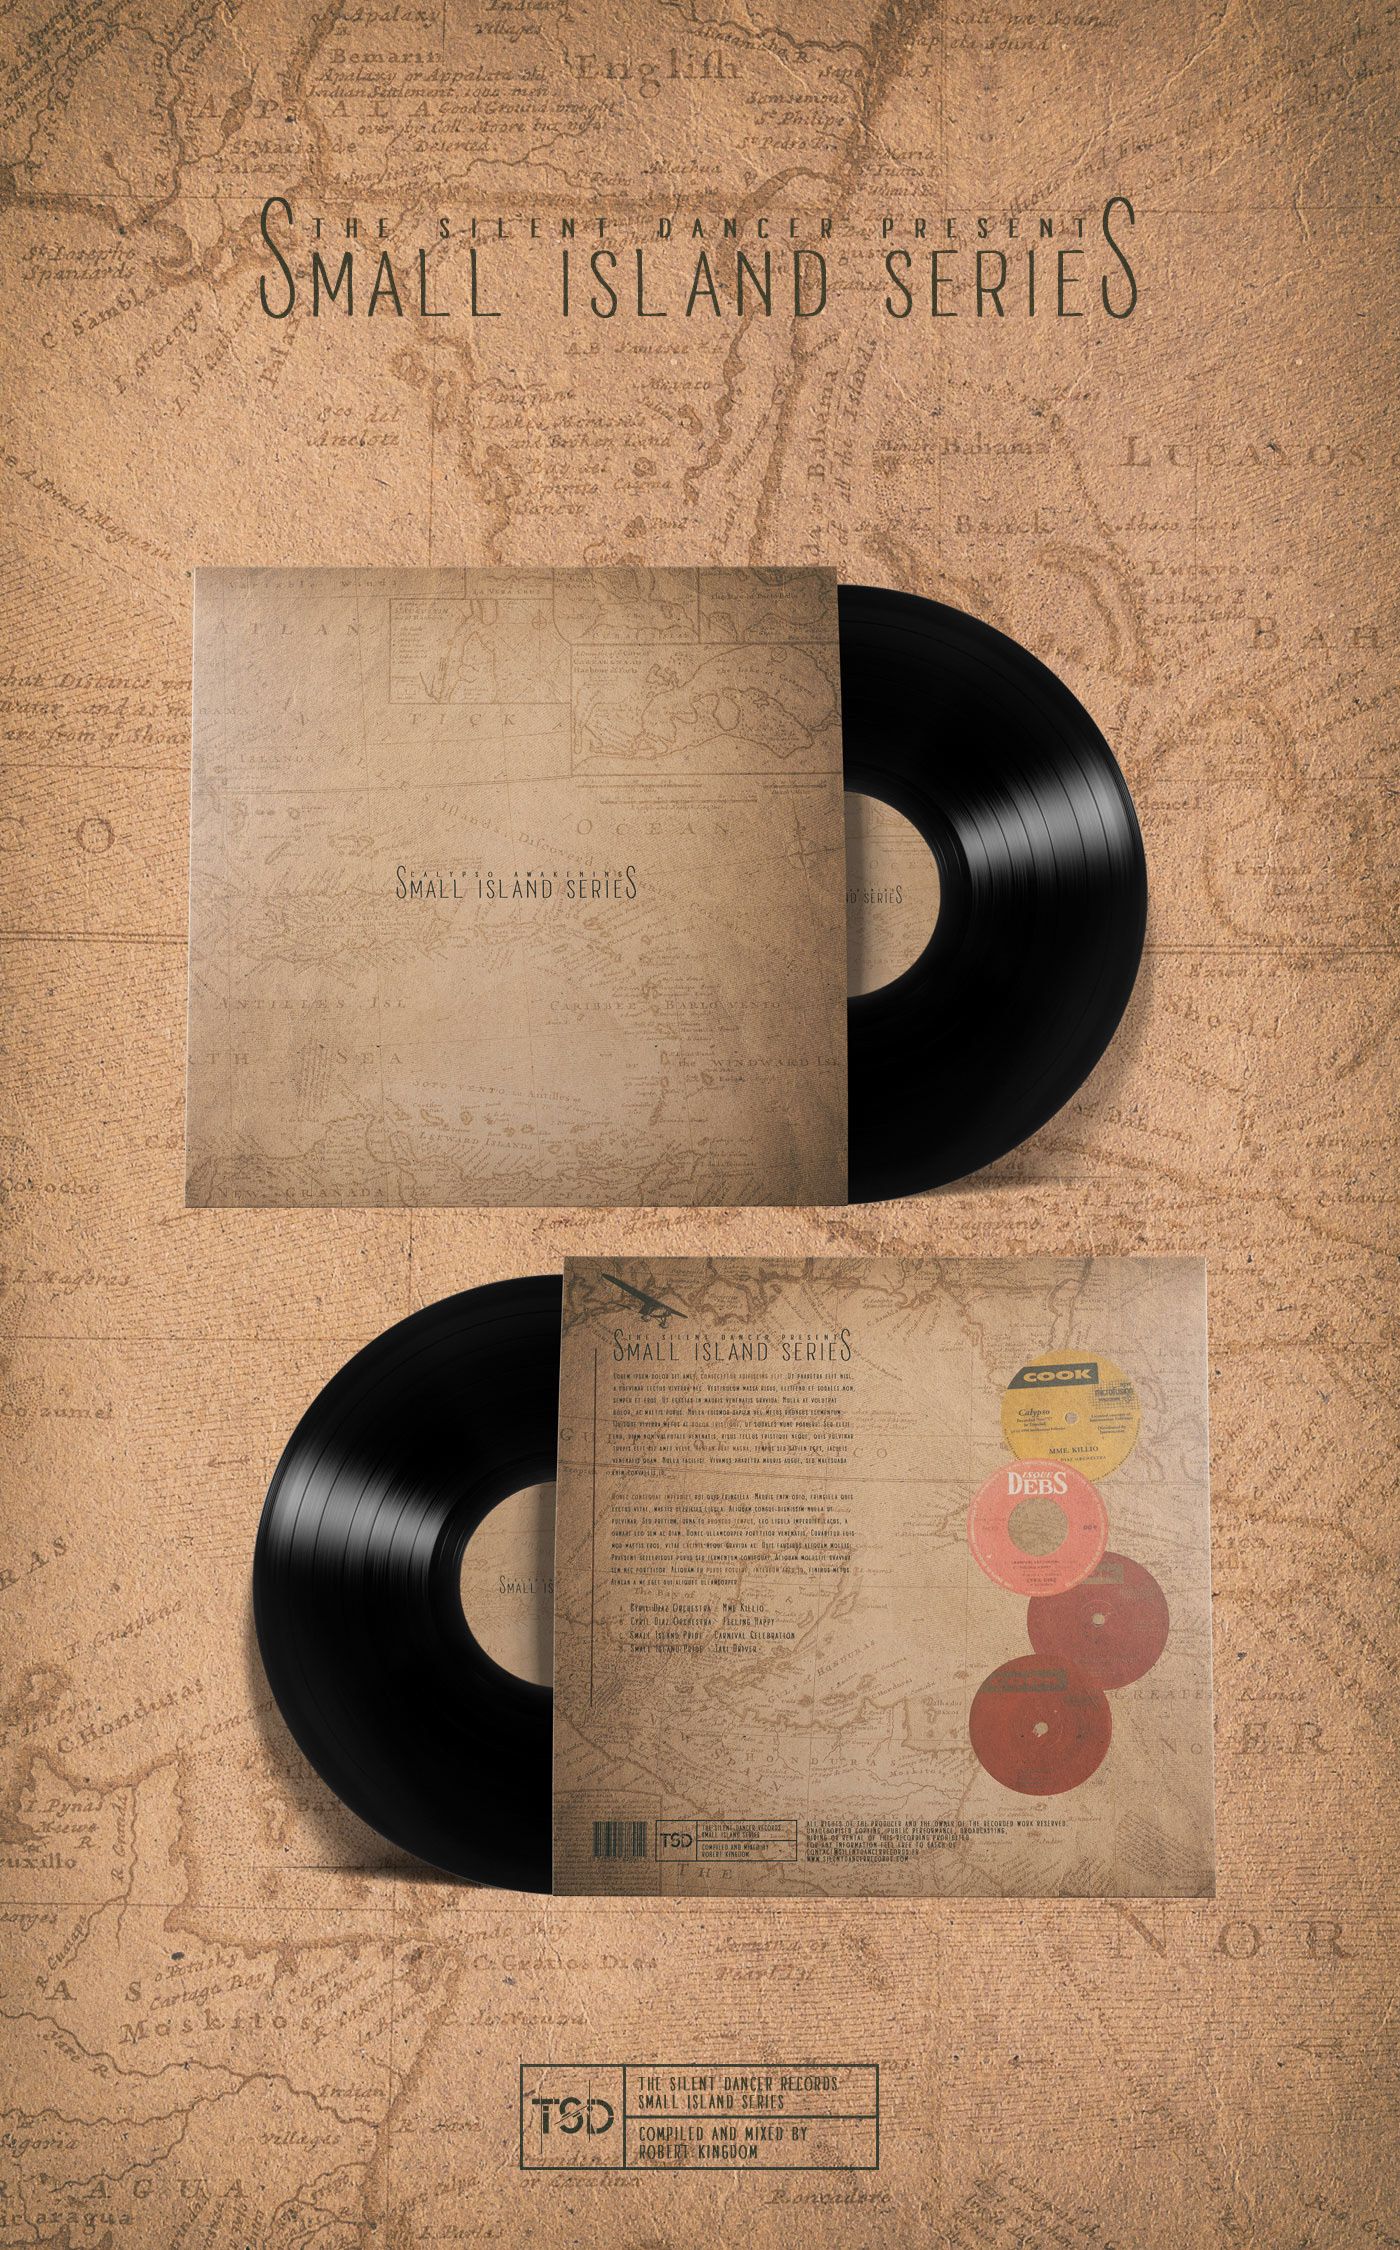 Musique Vinyl Cover artwork album cover vinyl graphisme vinyle